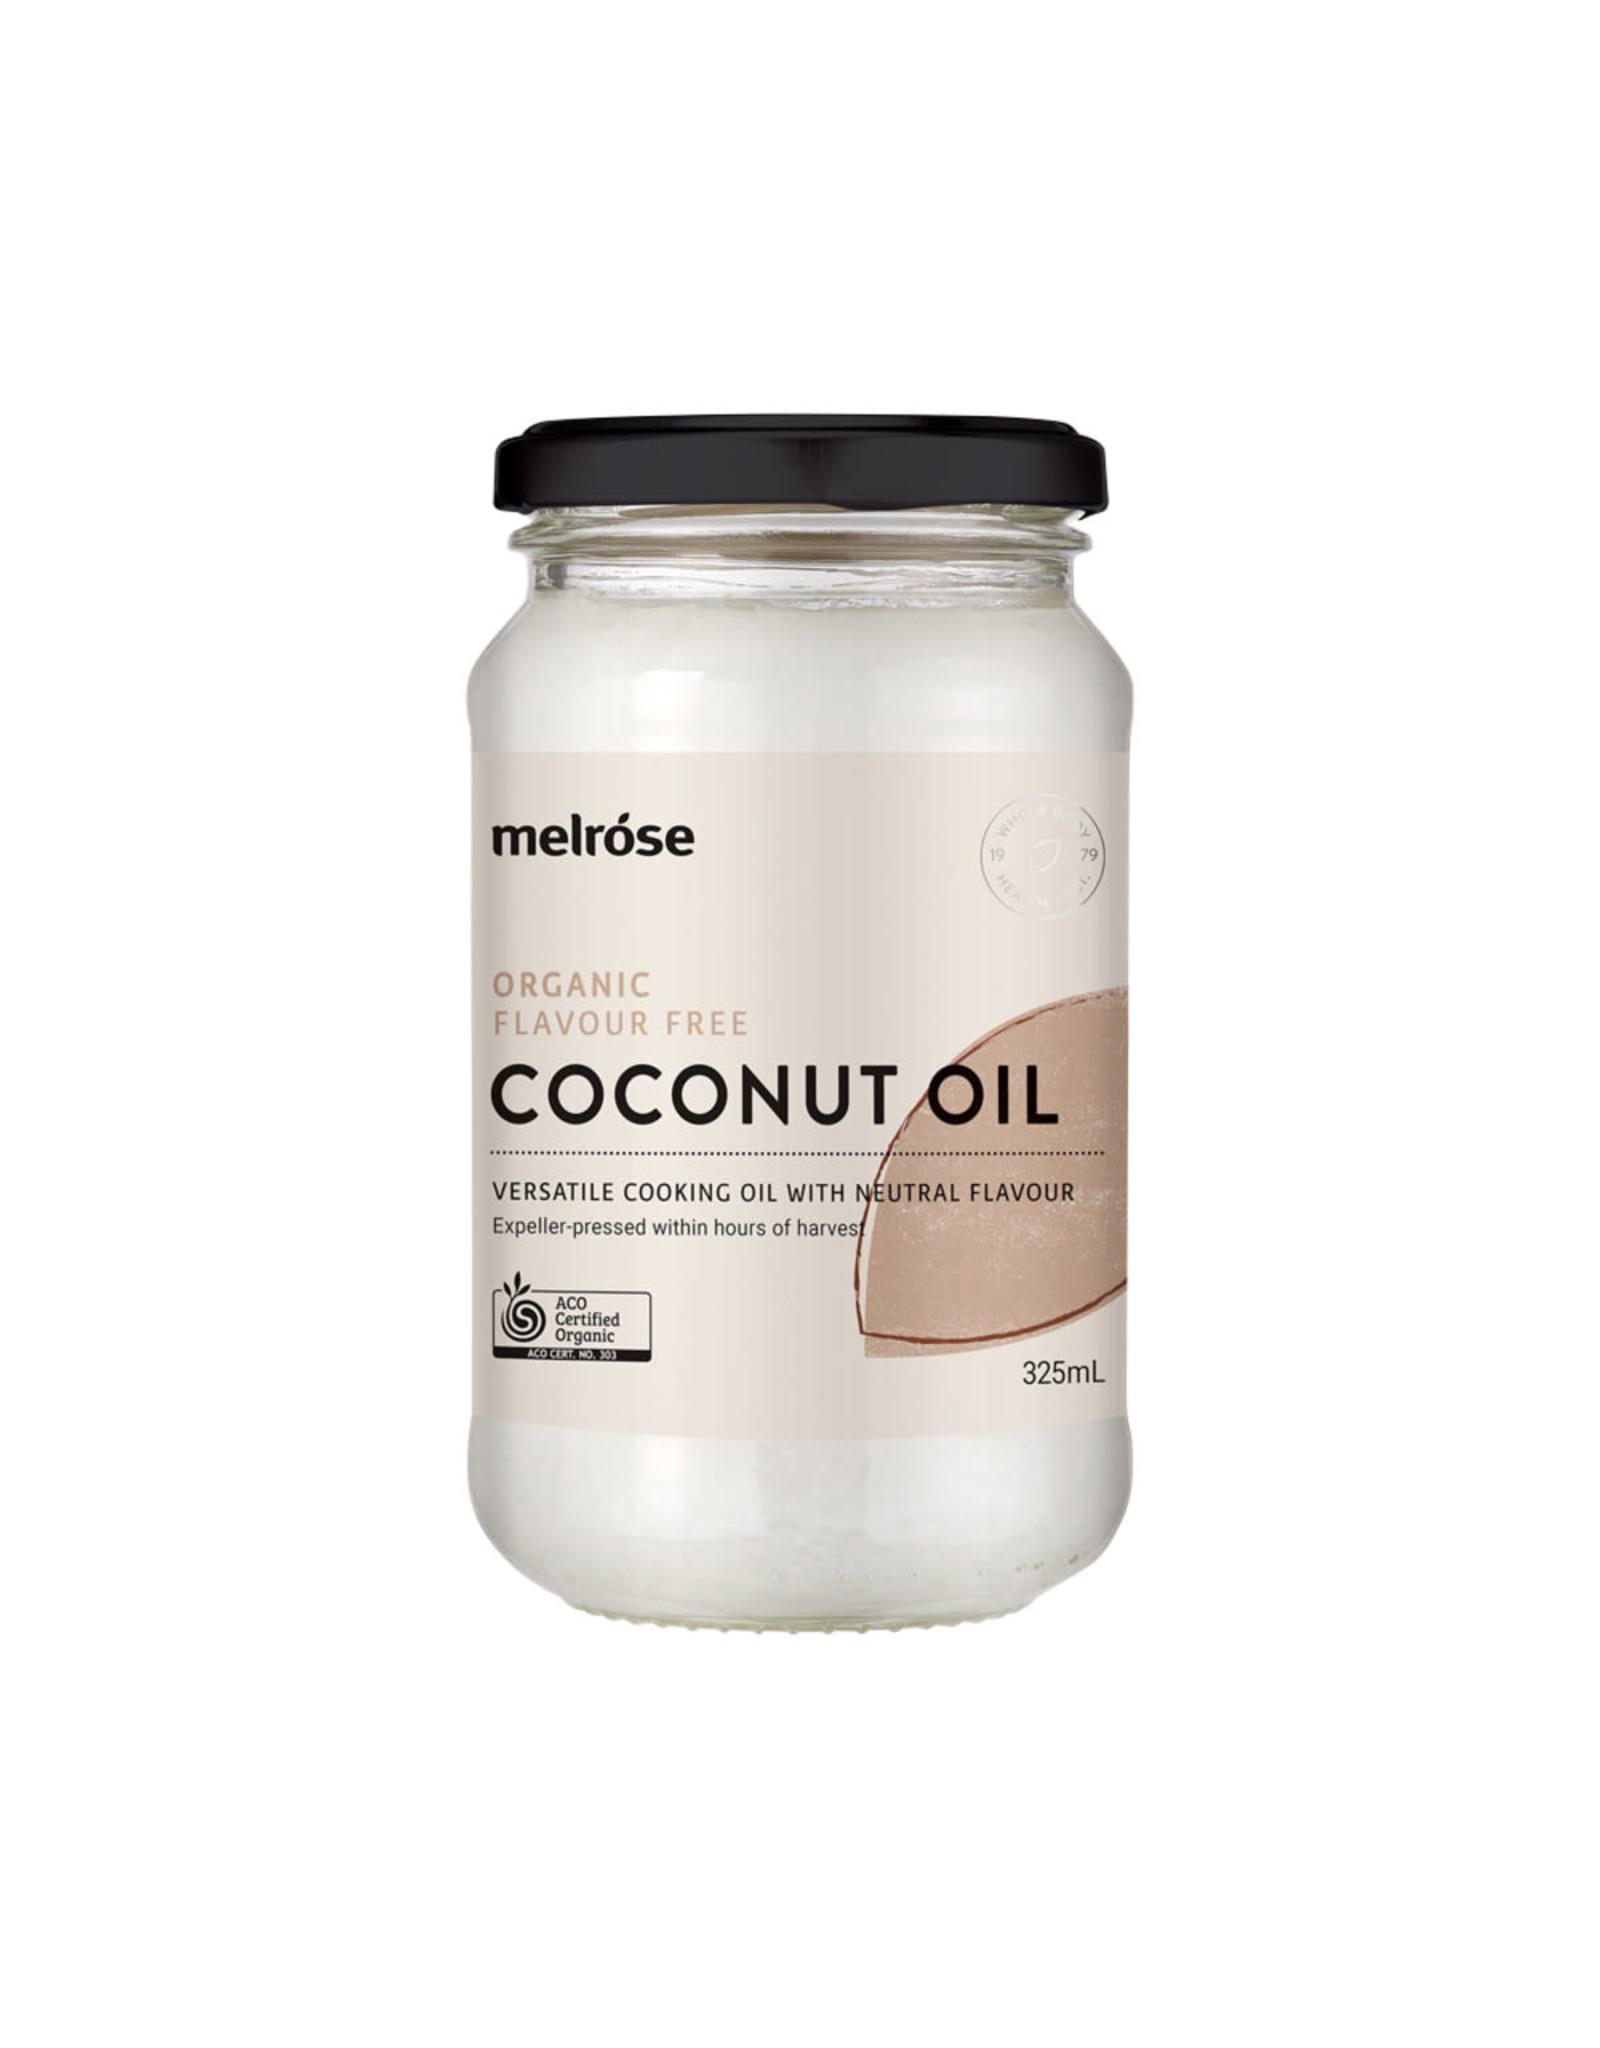 Organic Coconut Oil Flavour Free 325ml